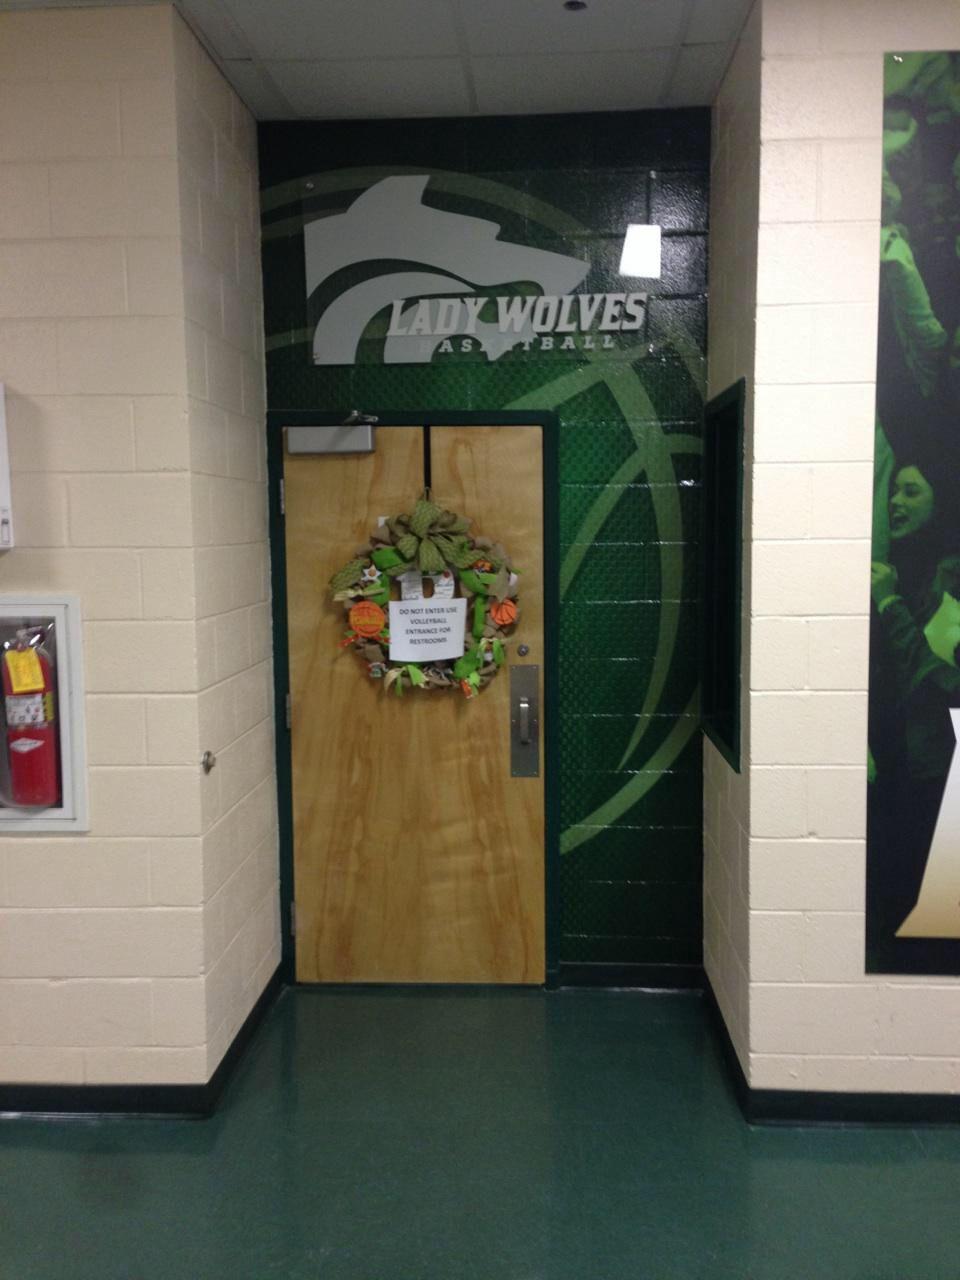 Buford Basketball locker room wall graphic with acrylic